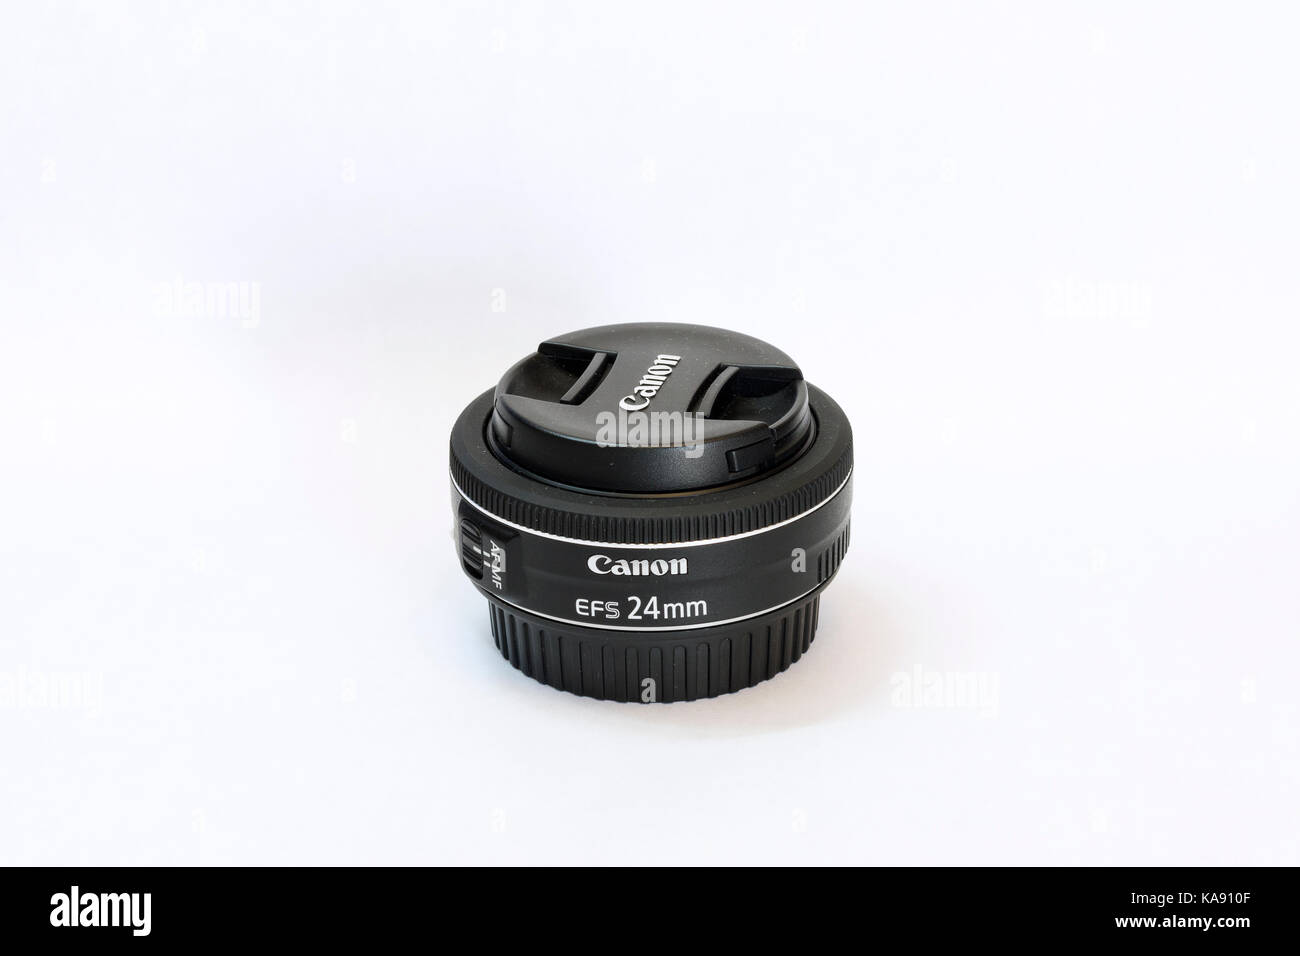 Canon EF-S 24mm f2.8 STM lens Stock Photo